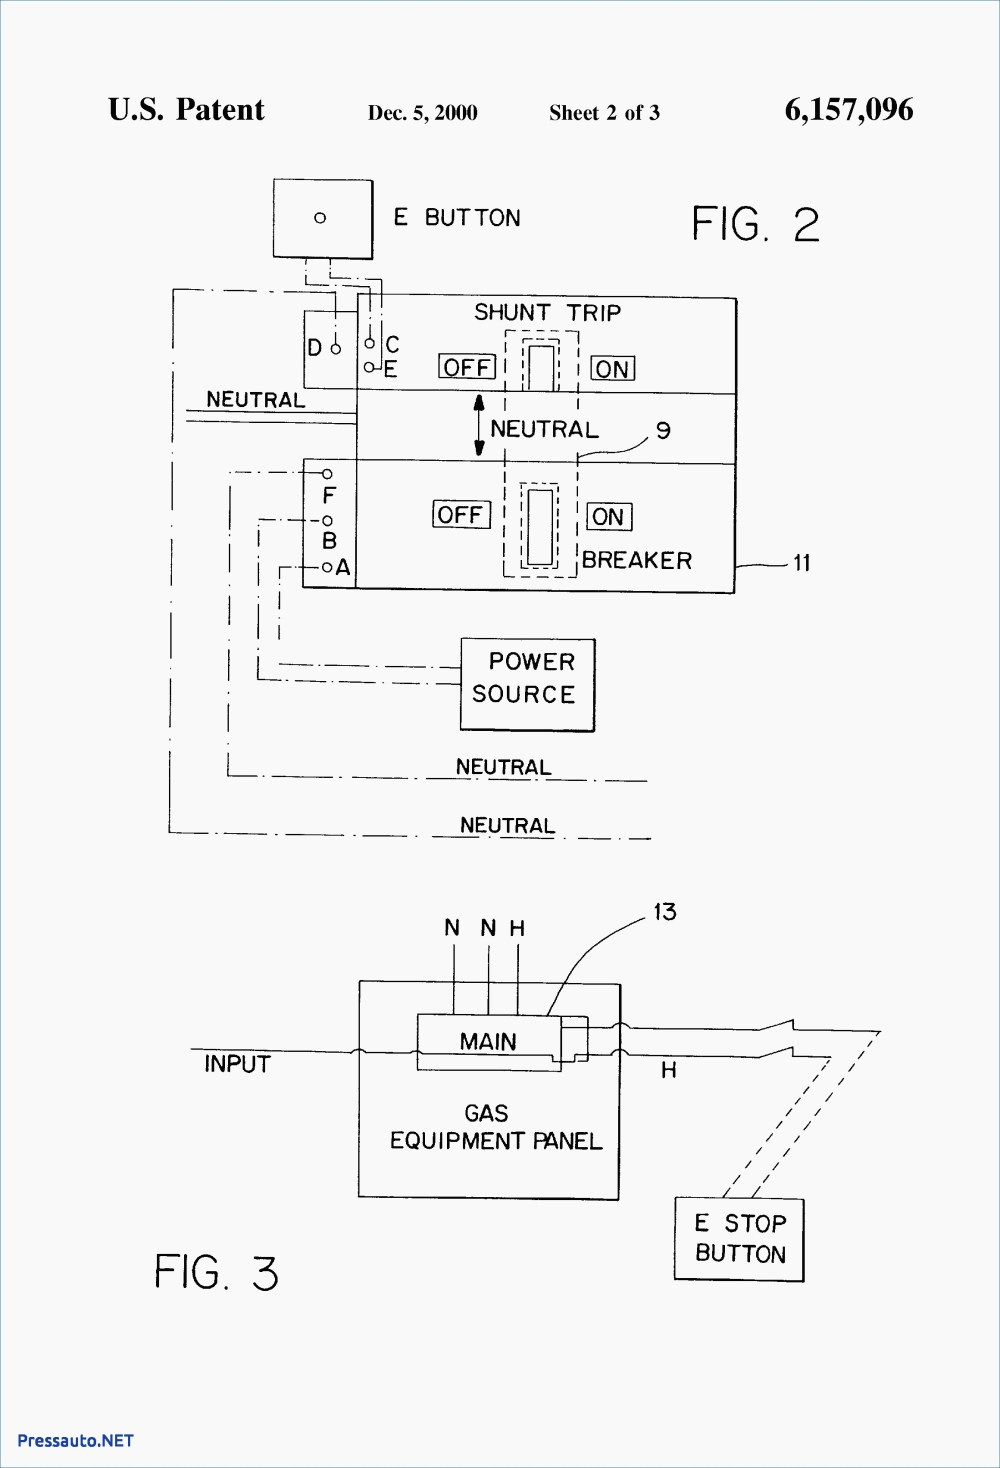 medium resolution of eaton shunt trip diagram wiring diagram expertshunt trip circuit breaker diagram wiring diagram data val eaton